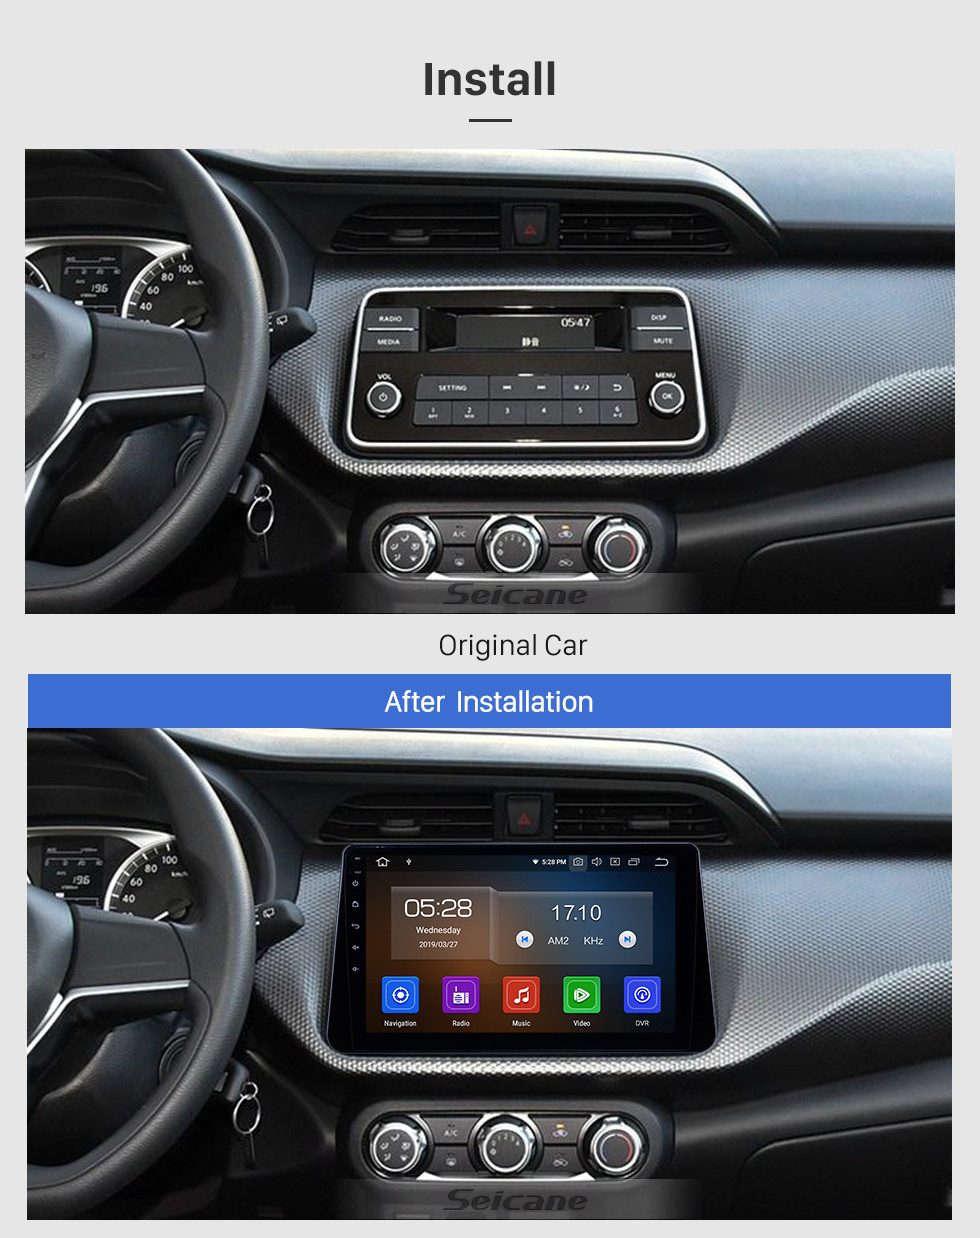 Seicane 10,1 Zoll Android 9.0 Radio für 2017-2019 Nissan Kicks mit Bluetooth HD Touchscreen GPS-Navigation Carplay-Unterstützung Digital-TV